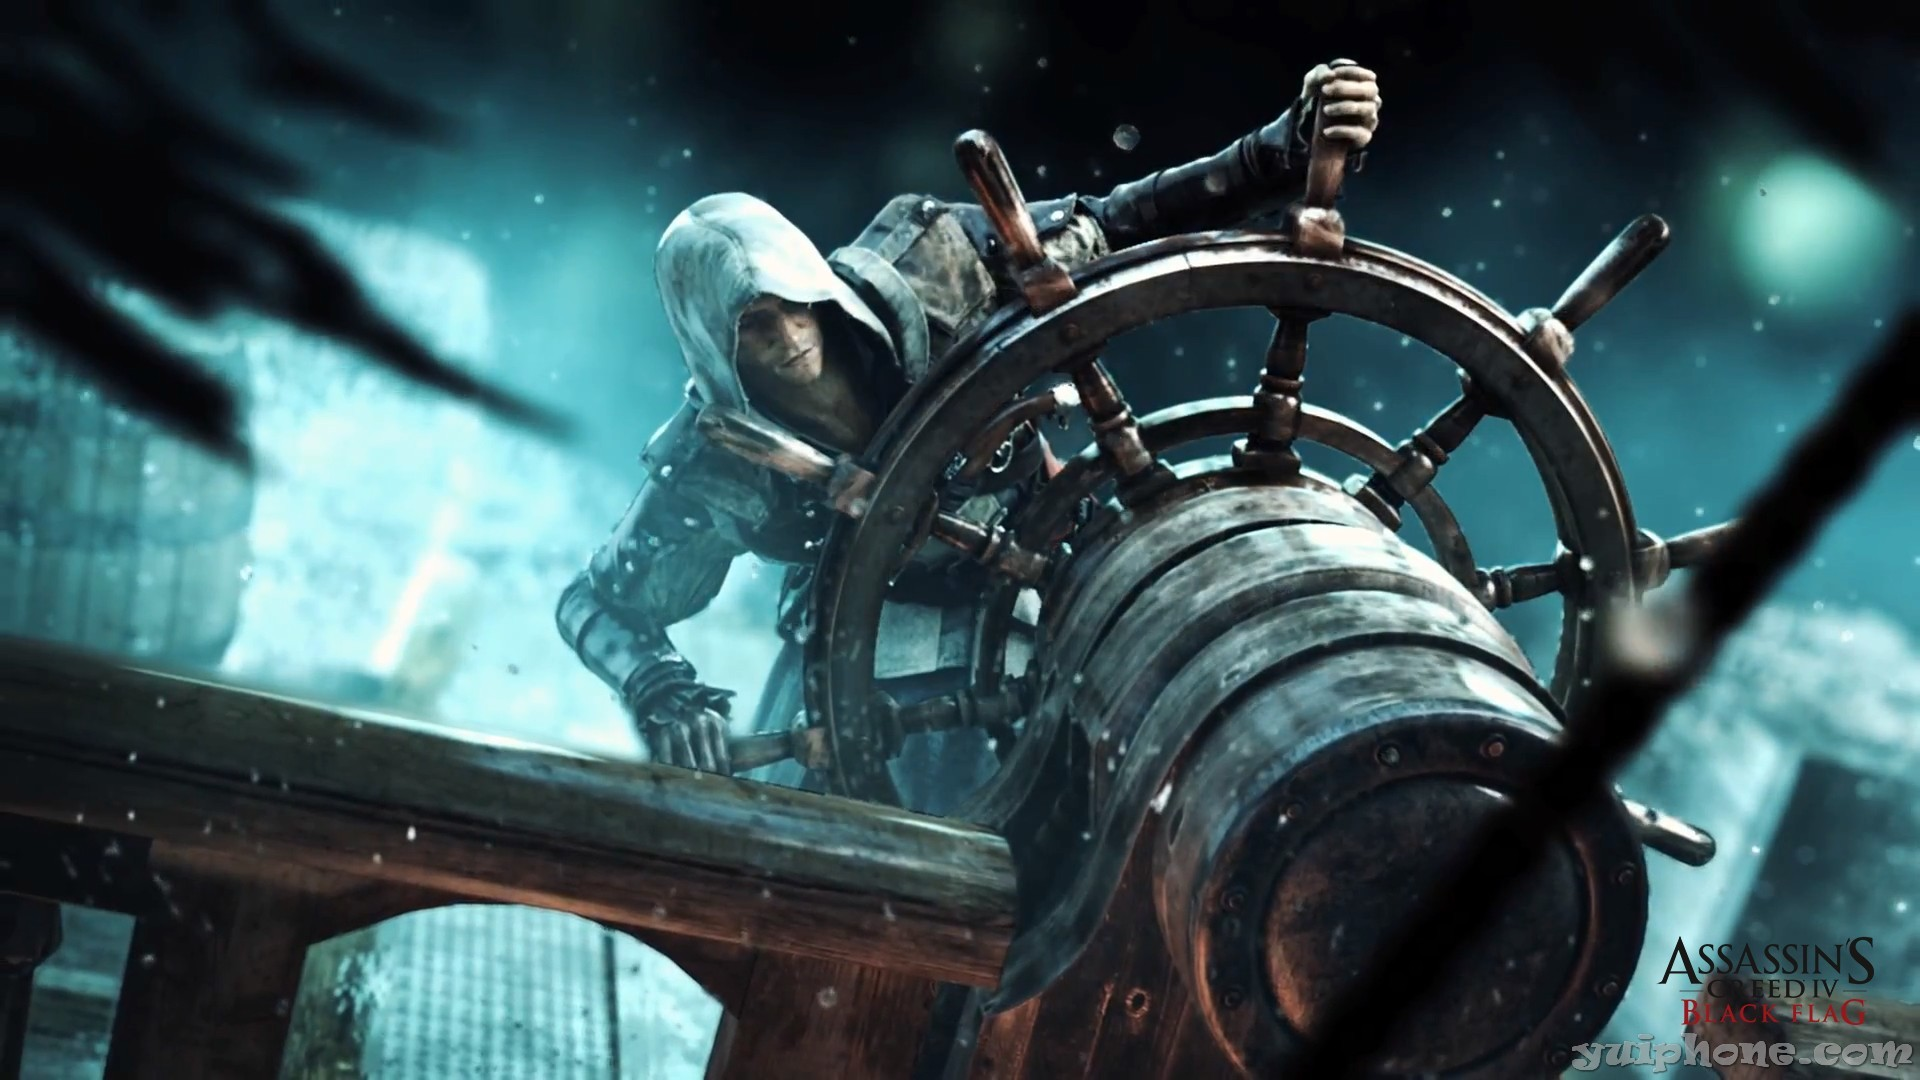 Edward-Kenway-at-the-helm-AC4-Assassins-Creed-Black-Flag .